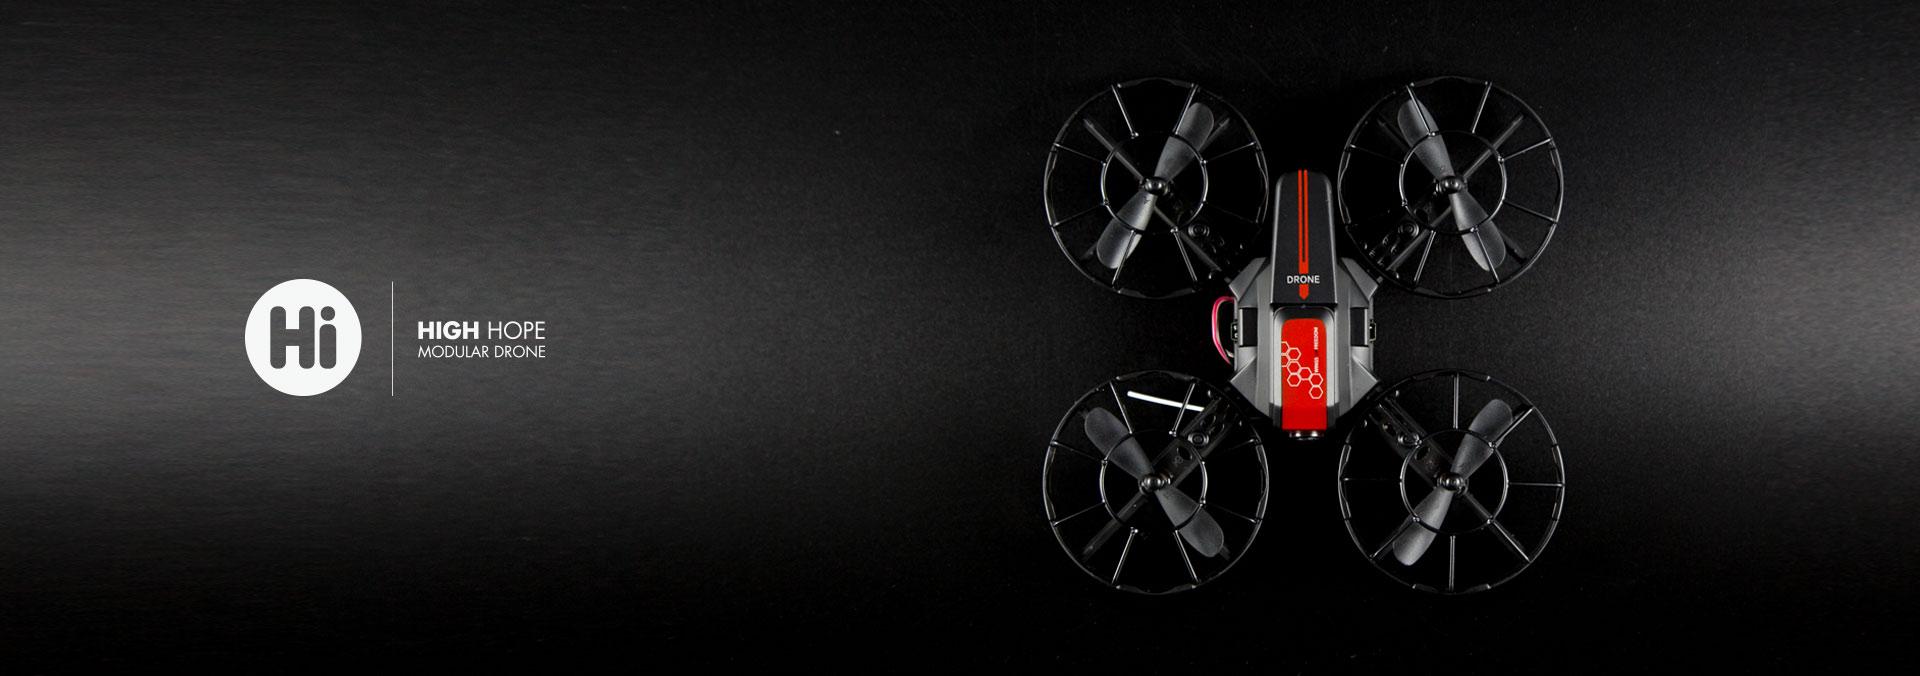 High Hope modular drone 81856-03